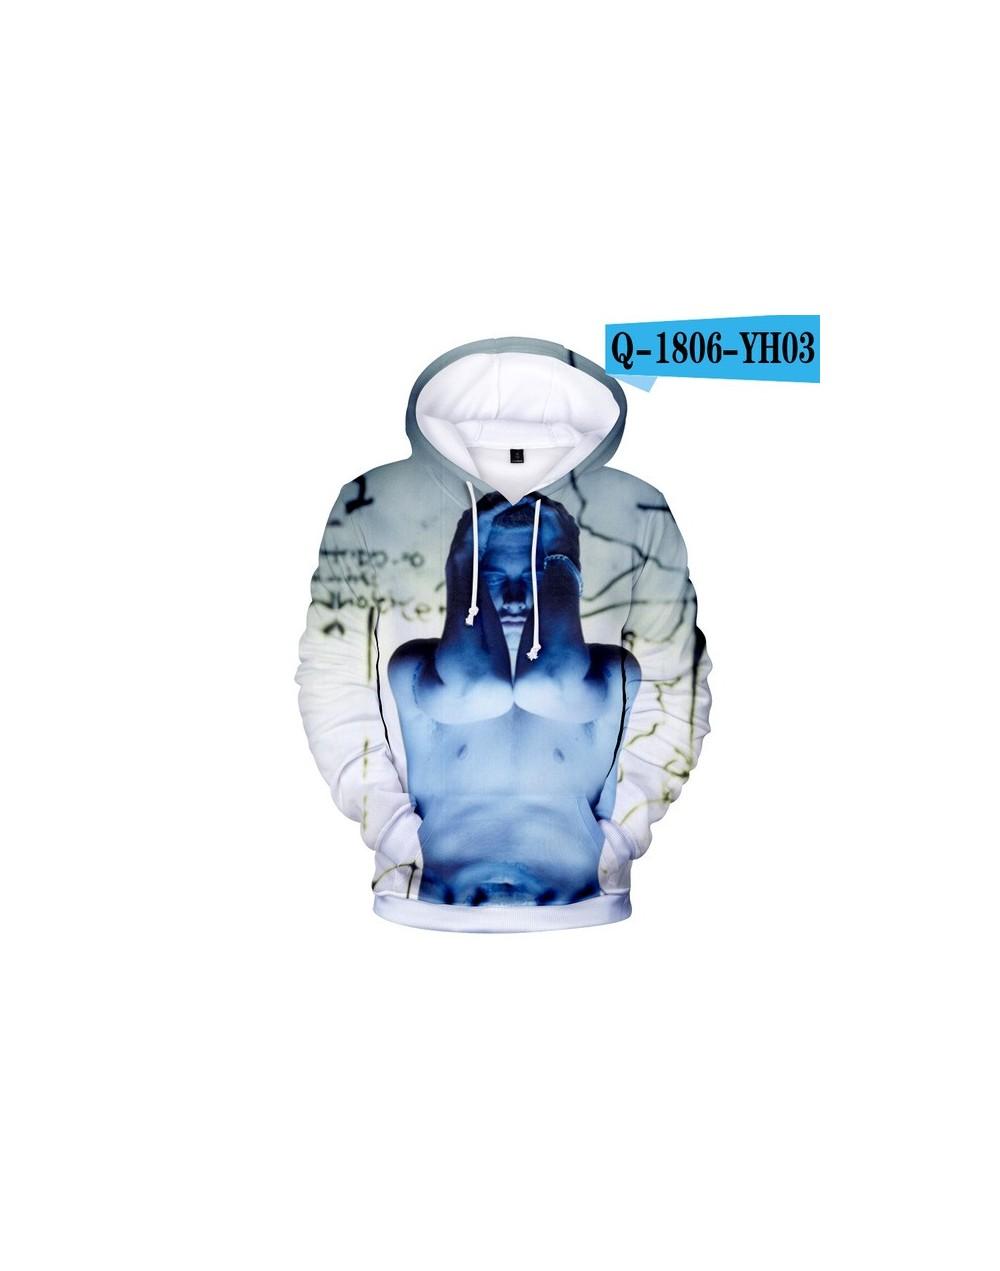 fshion 3D Print Hoodies Sweatshirts Harajuku Fashion Women/Men Hoodies Sweatshirt Fashion Clothes 4XL - Gold - 4D4154043766-6